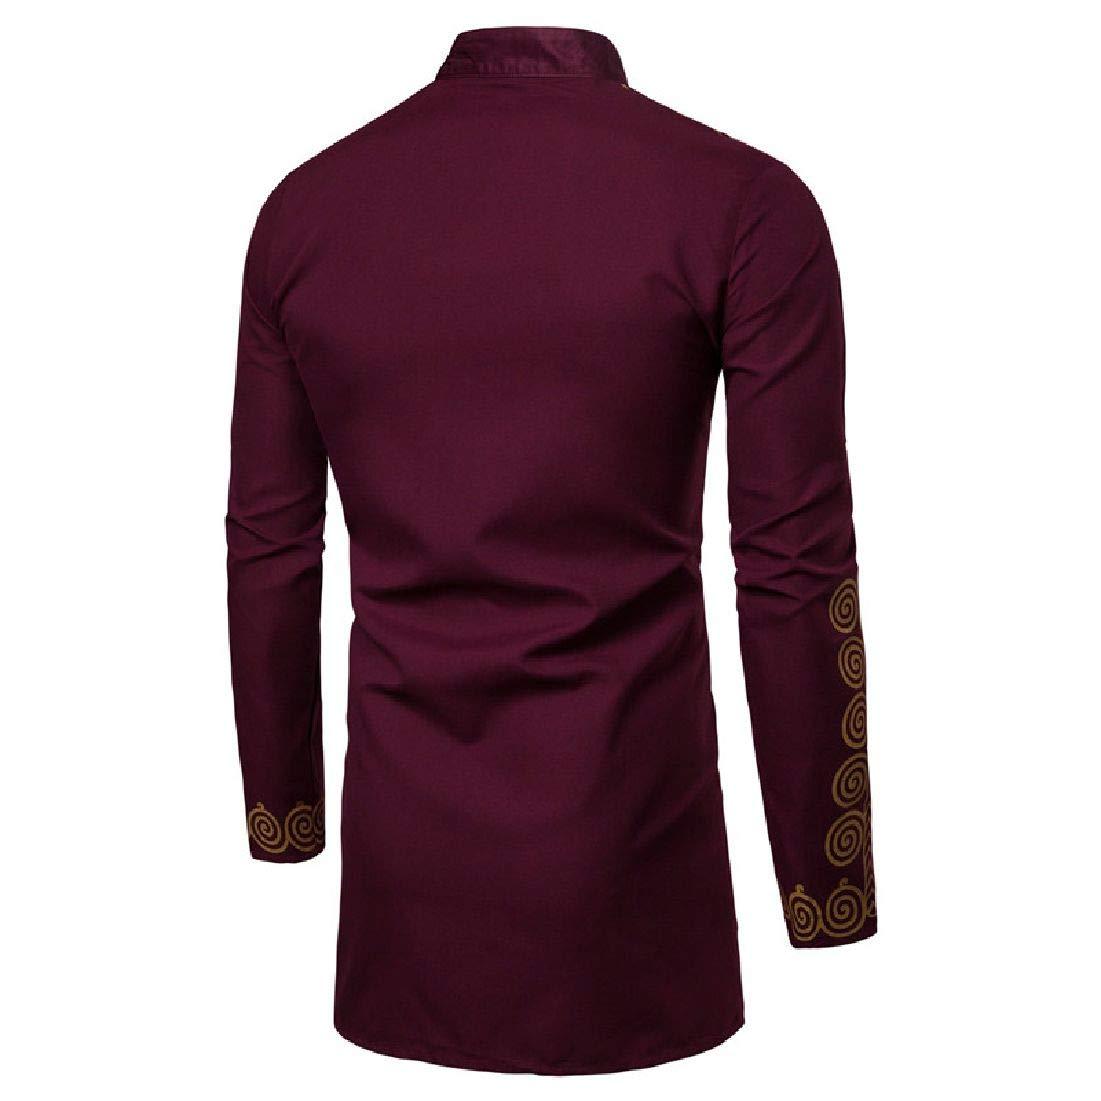 Zantt Mens Luxury Dashiki African Print Longline Shirt Metallic Floral Ethnic Shirts